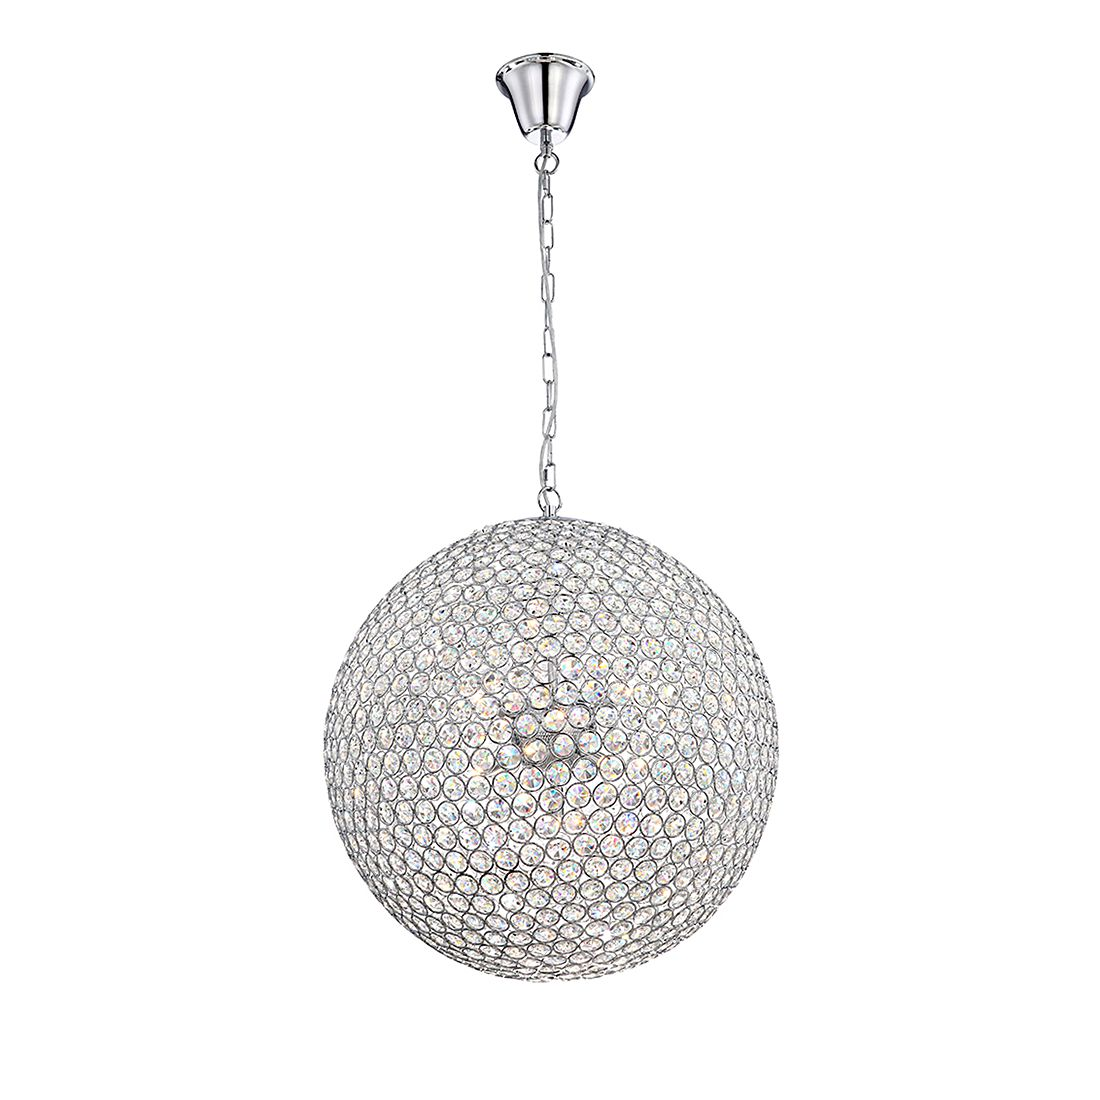 Pendelleuchte Emilia I ● Metall ● Silber ● 8-flammig- Lux A++